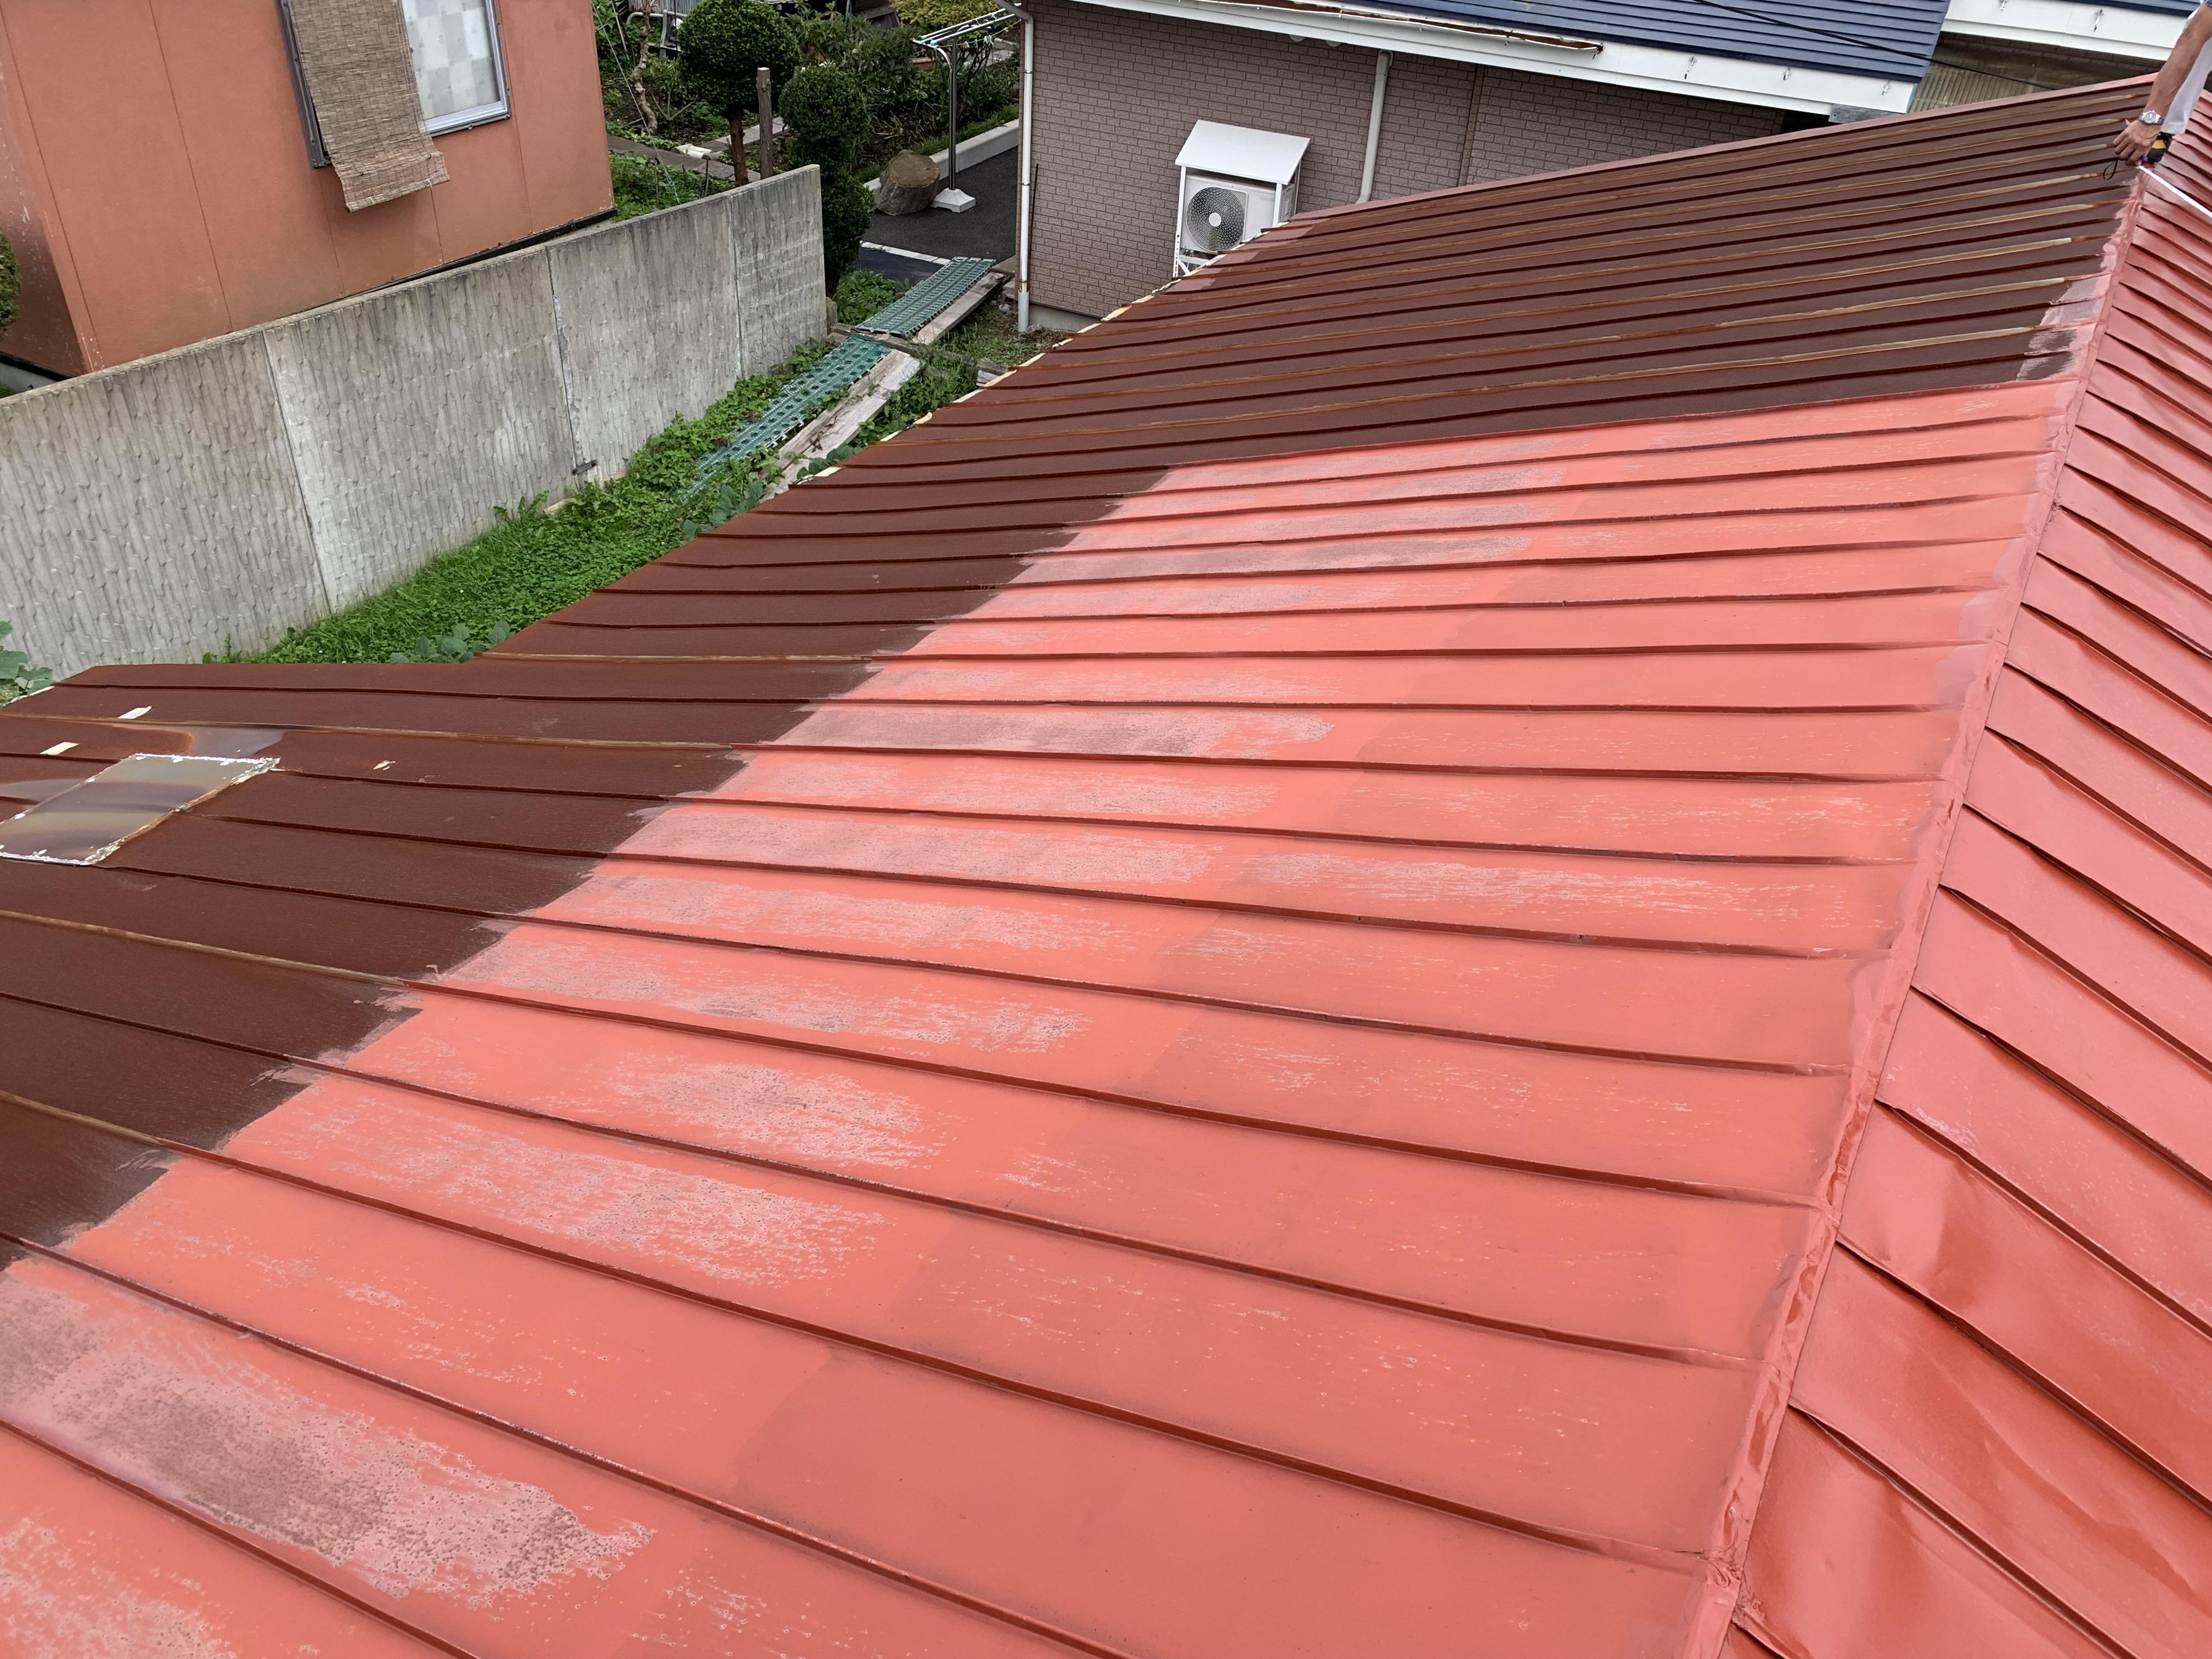 【八戸】屋根塗装が完了しました! 外壁塗装|屋根塗装|塗装業者|塗装屋|塗装会社